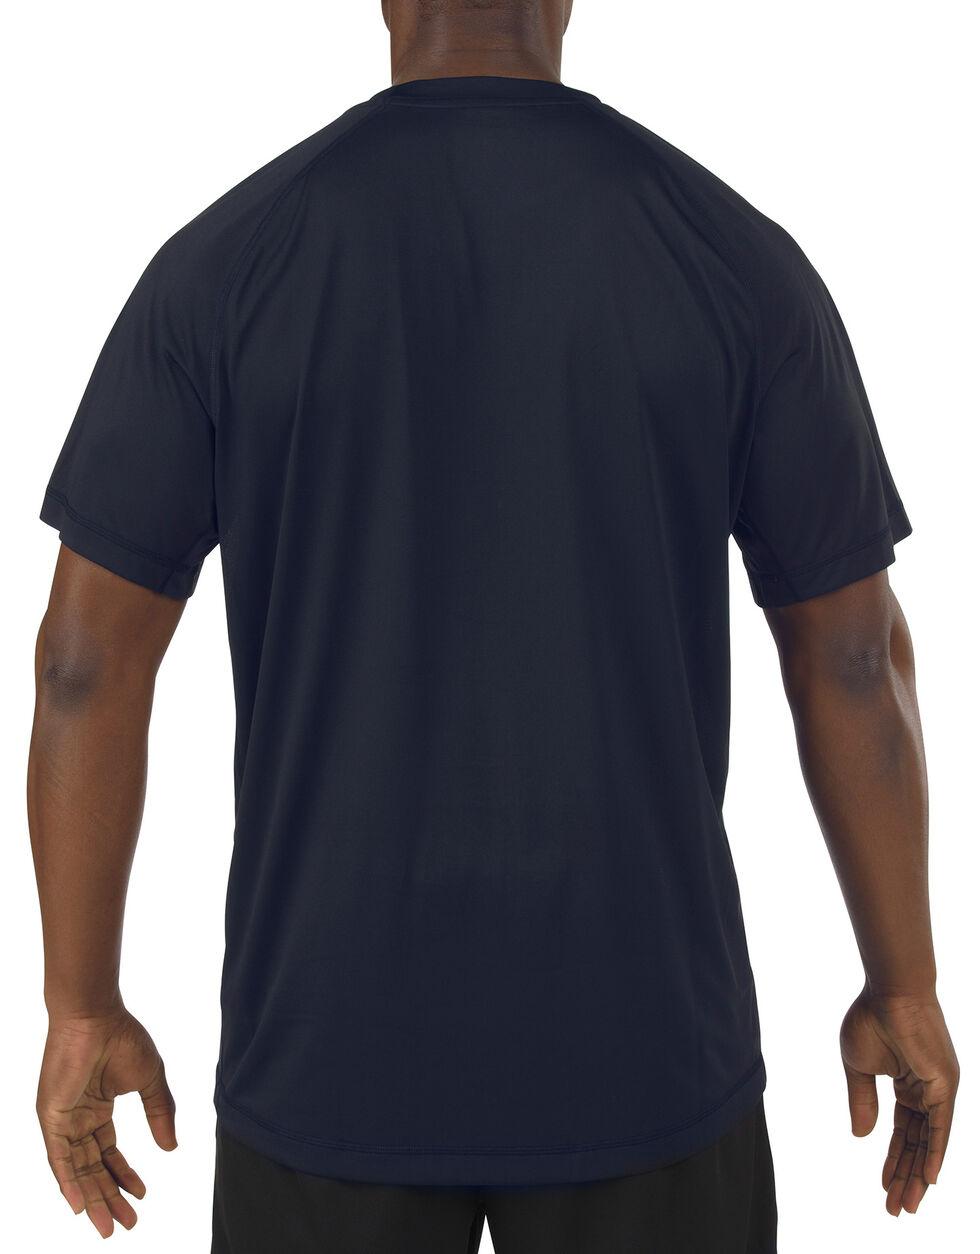 5.11 Tactical Utility PT Shirt, Navy, hi-res